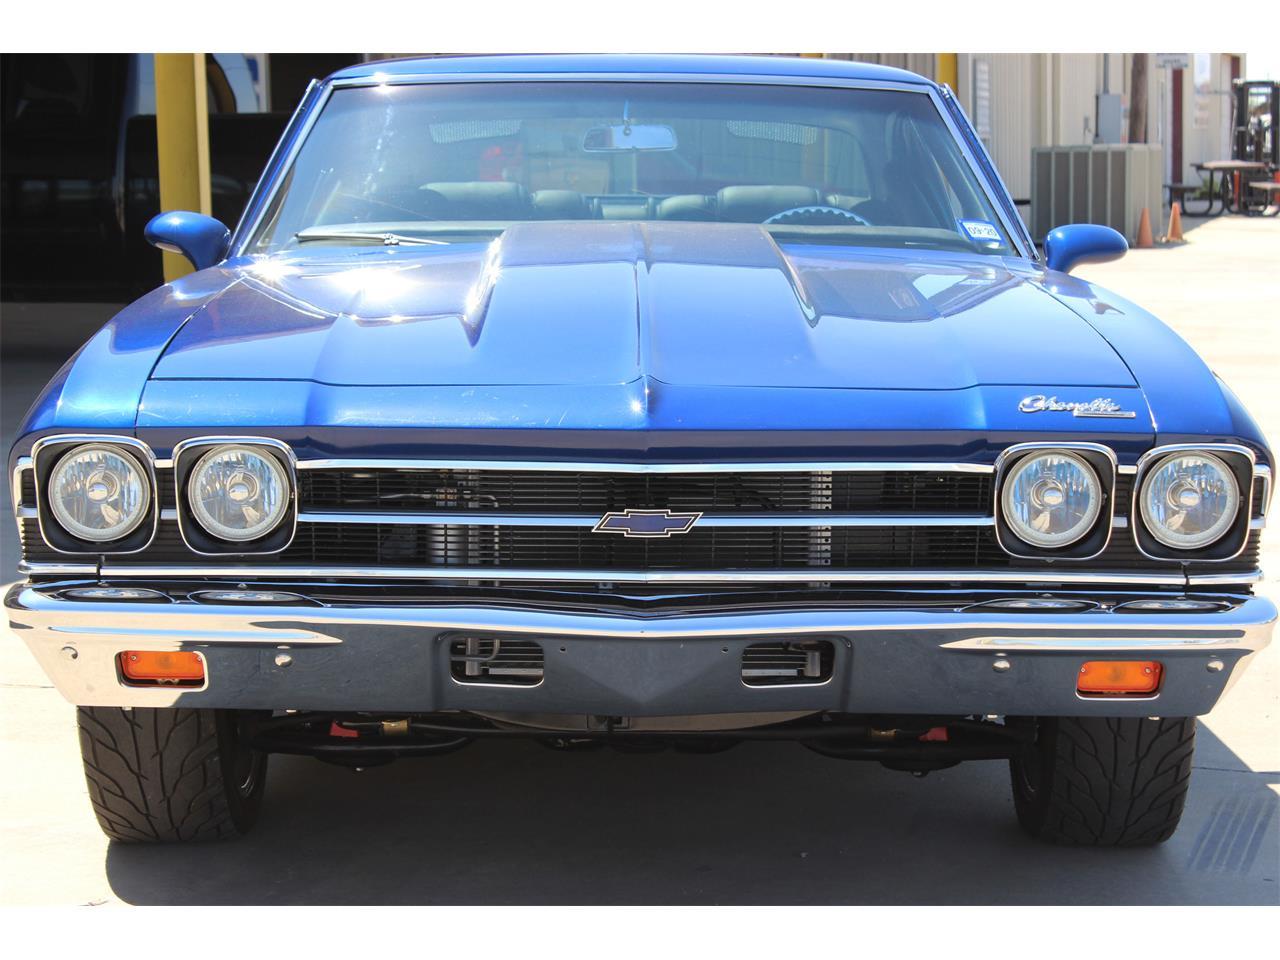 1968 Chevrolet Chevelle Malibu (CC-1340286) for sale in Fort Worth, Texas